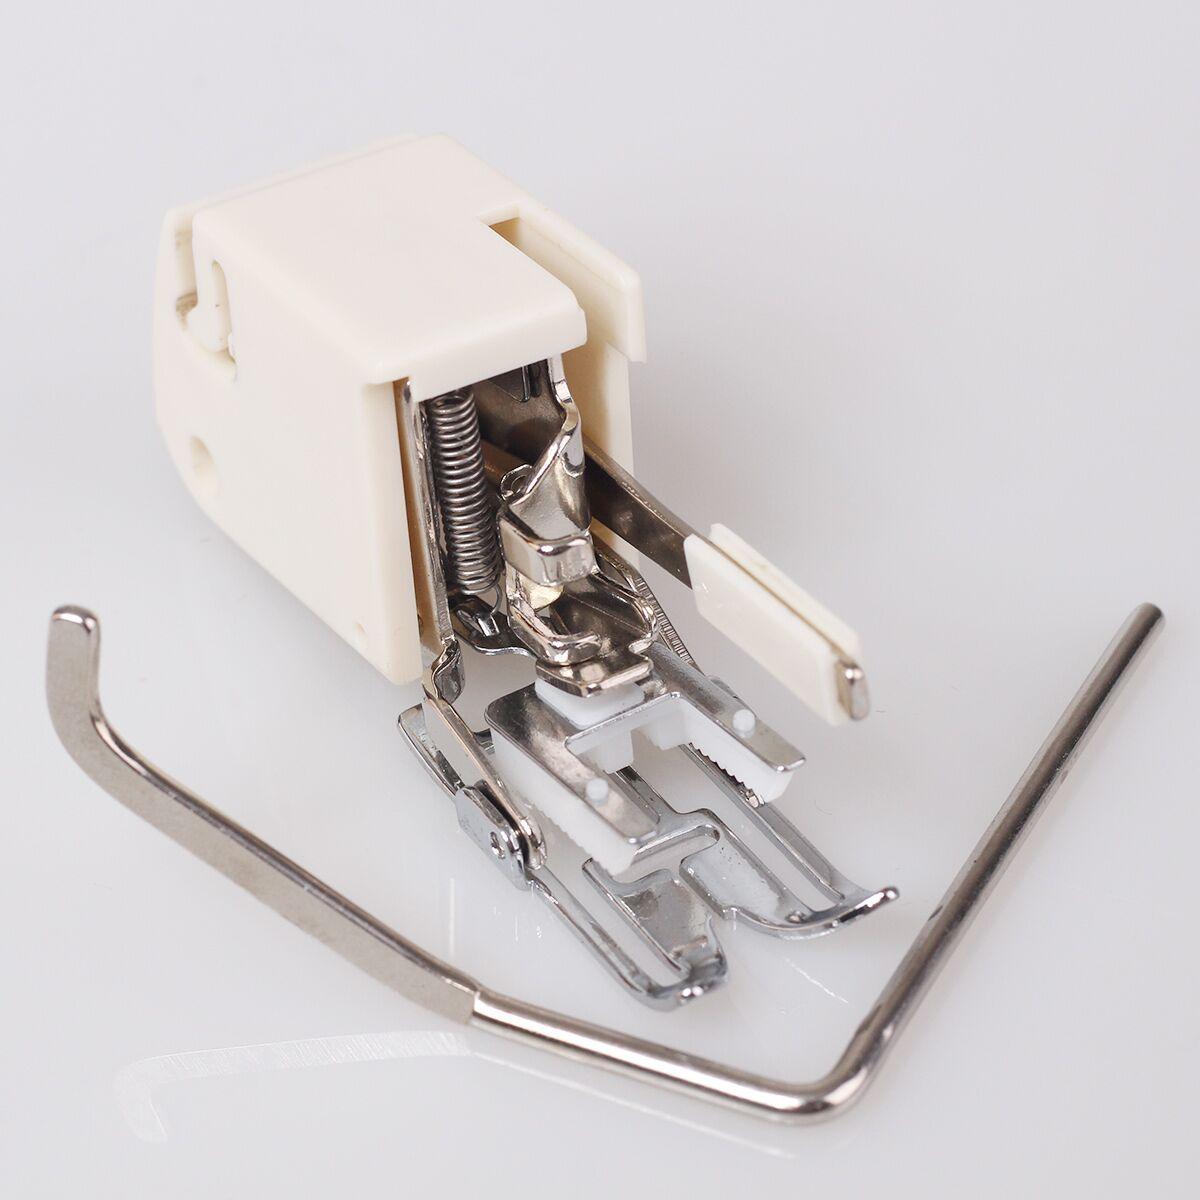 Aliexpress Com Buy Janome Sewing Machine Parts Presser